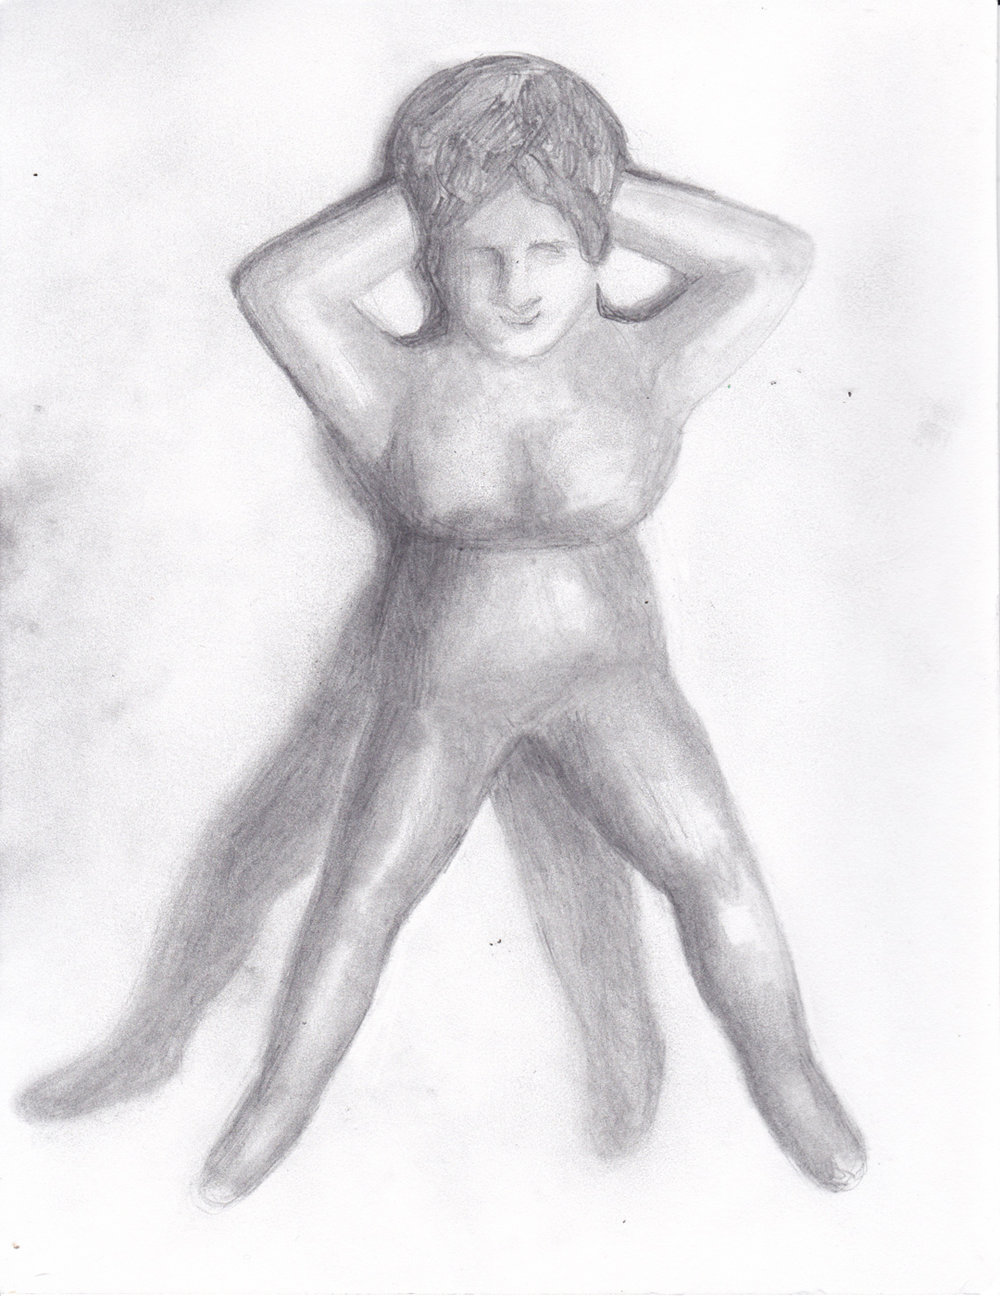 PORTIA_Munson_romeo_erotic.jpg